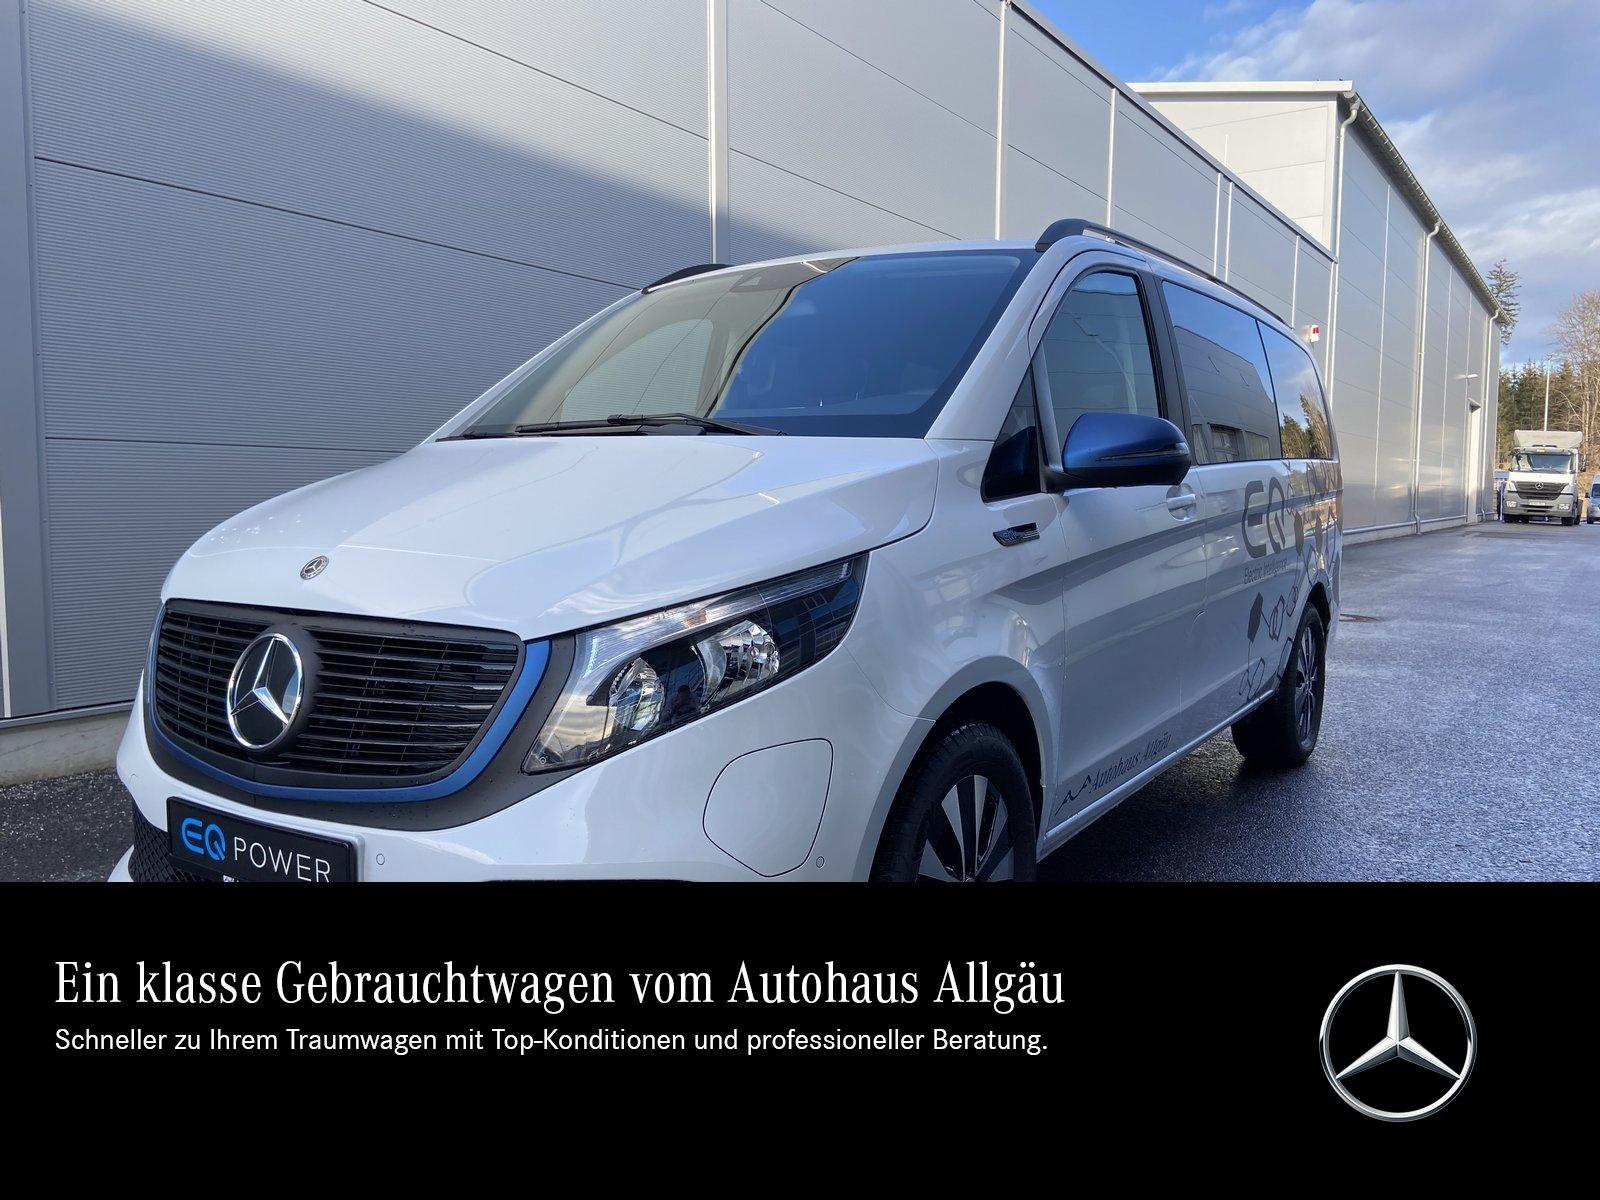 Mercedes-Benz EQV 300 Lang 6-Sitzer MBUX Distronic, Jahr 2020, Elektro